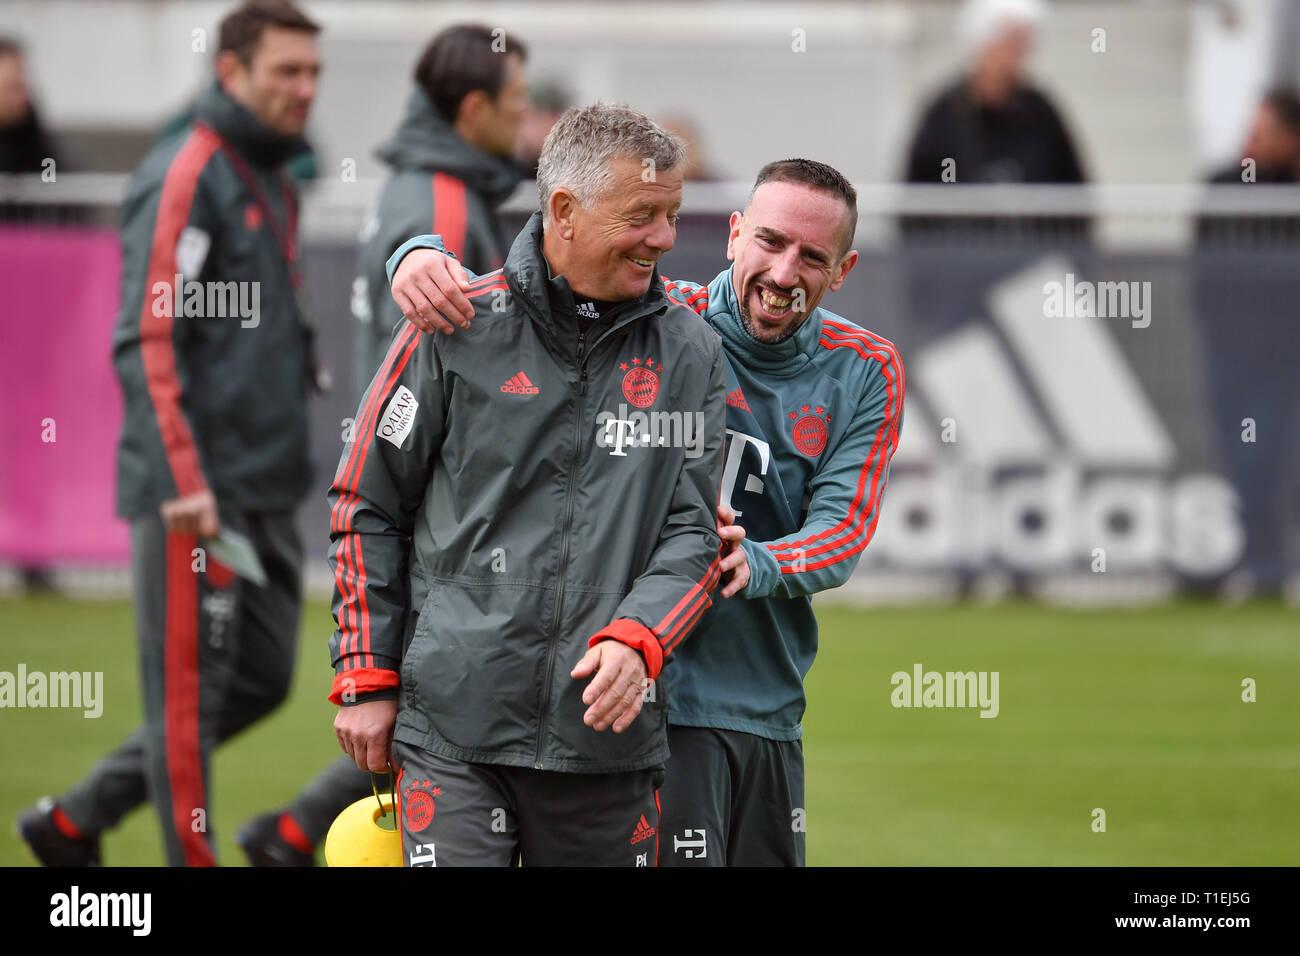 Munchen Deutschland 26 Mar 2019 Franck Ribery Bayern